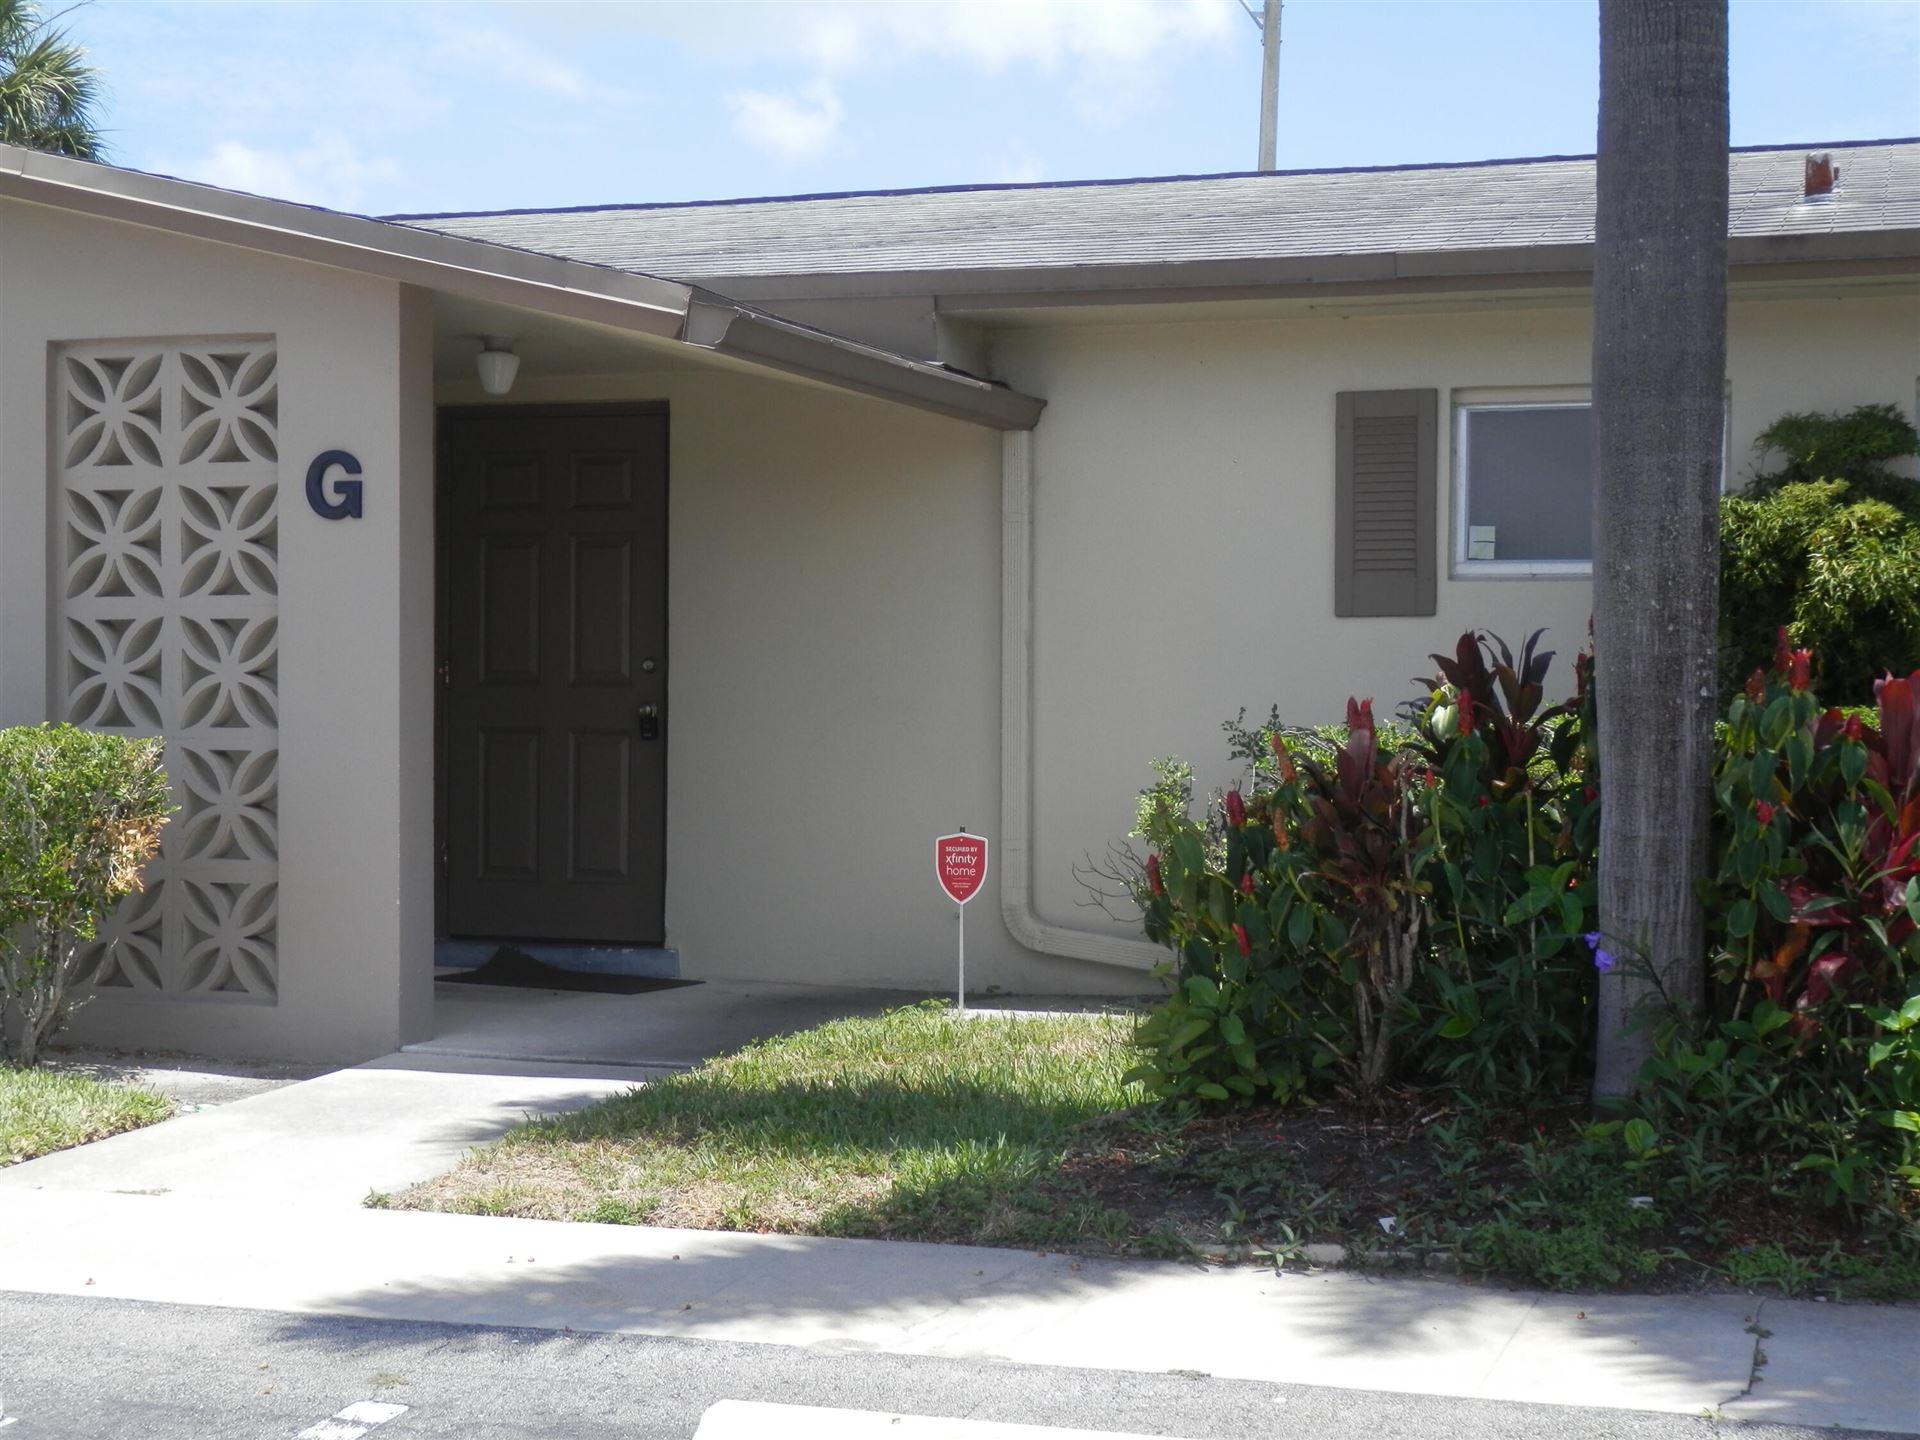 5243 Cresthaven Boulevard #G, West Palm Beach, FL 33415 - MLS#: RX-10722606